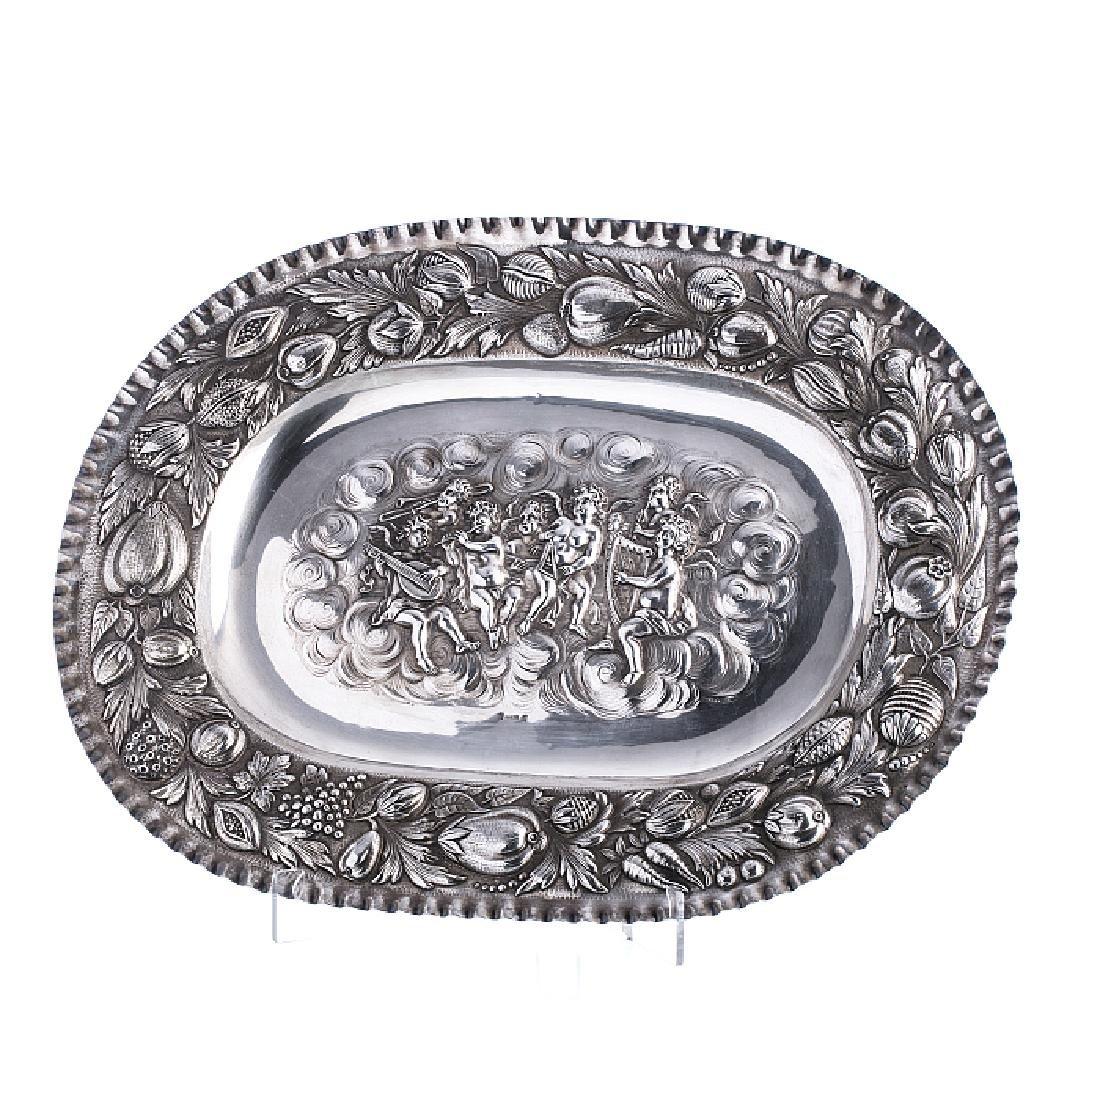 Cherubs platter in relieved silver